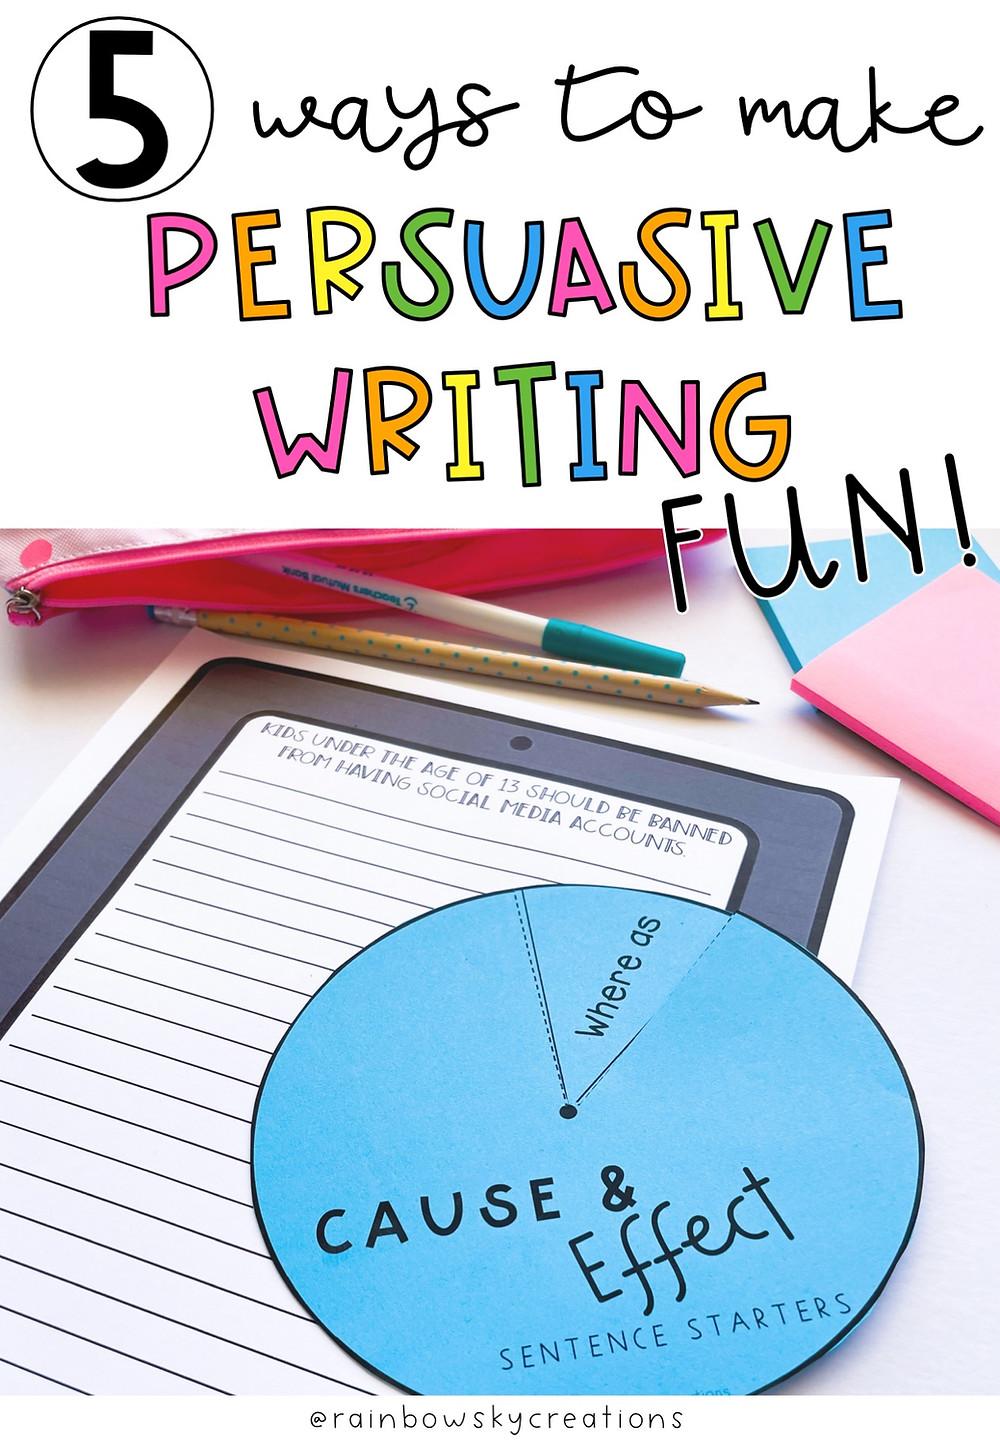 5-way-to-make-persuasive-writing-fun-for-kids